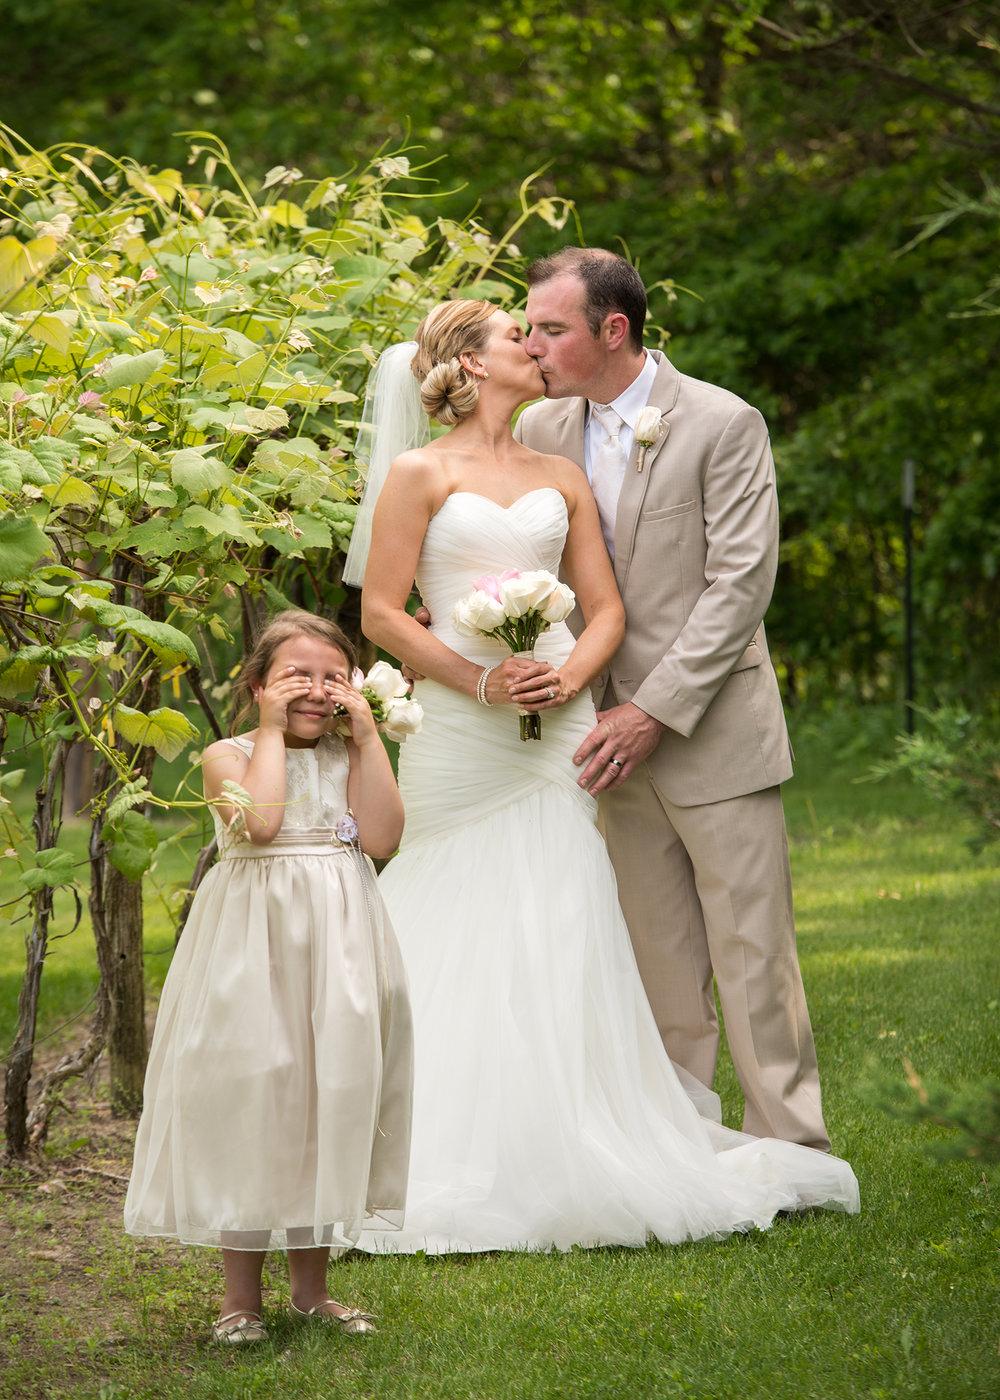 DRG-PHOTO-WEDDING-SCOTT-25.jpg